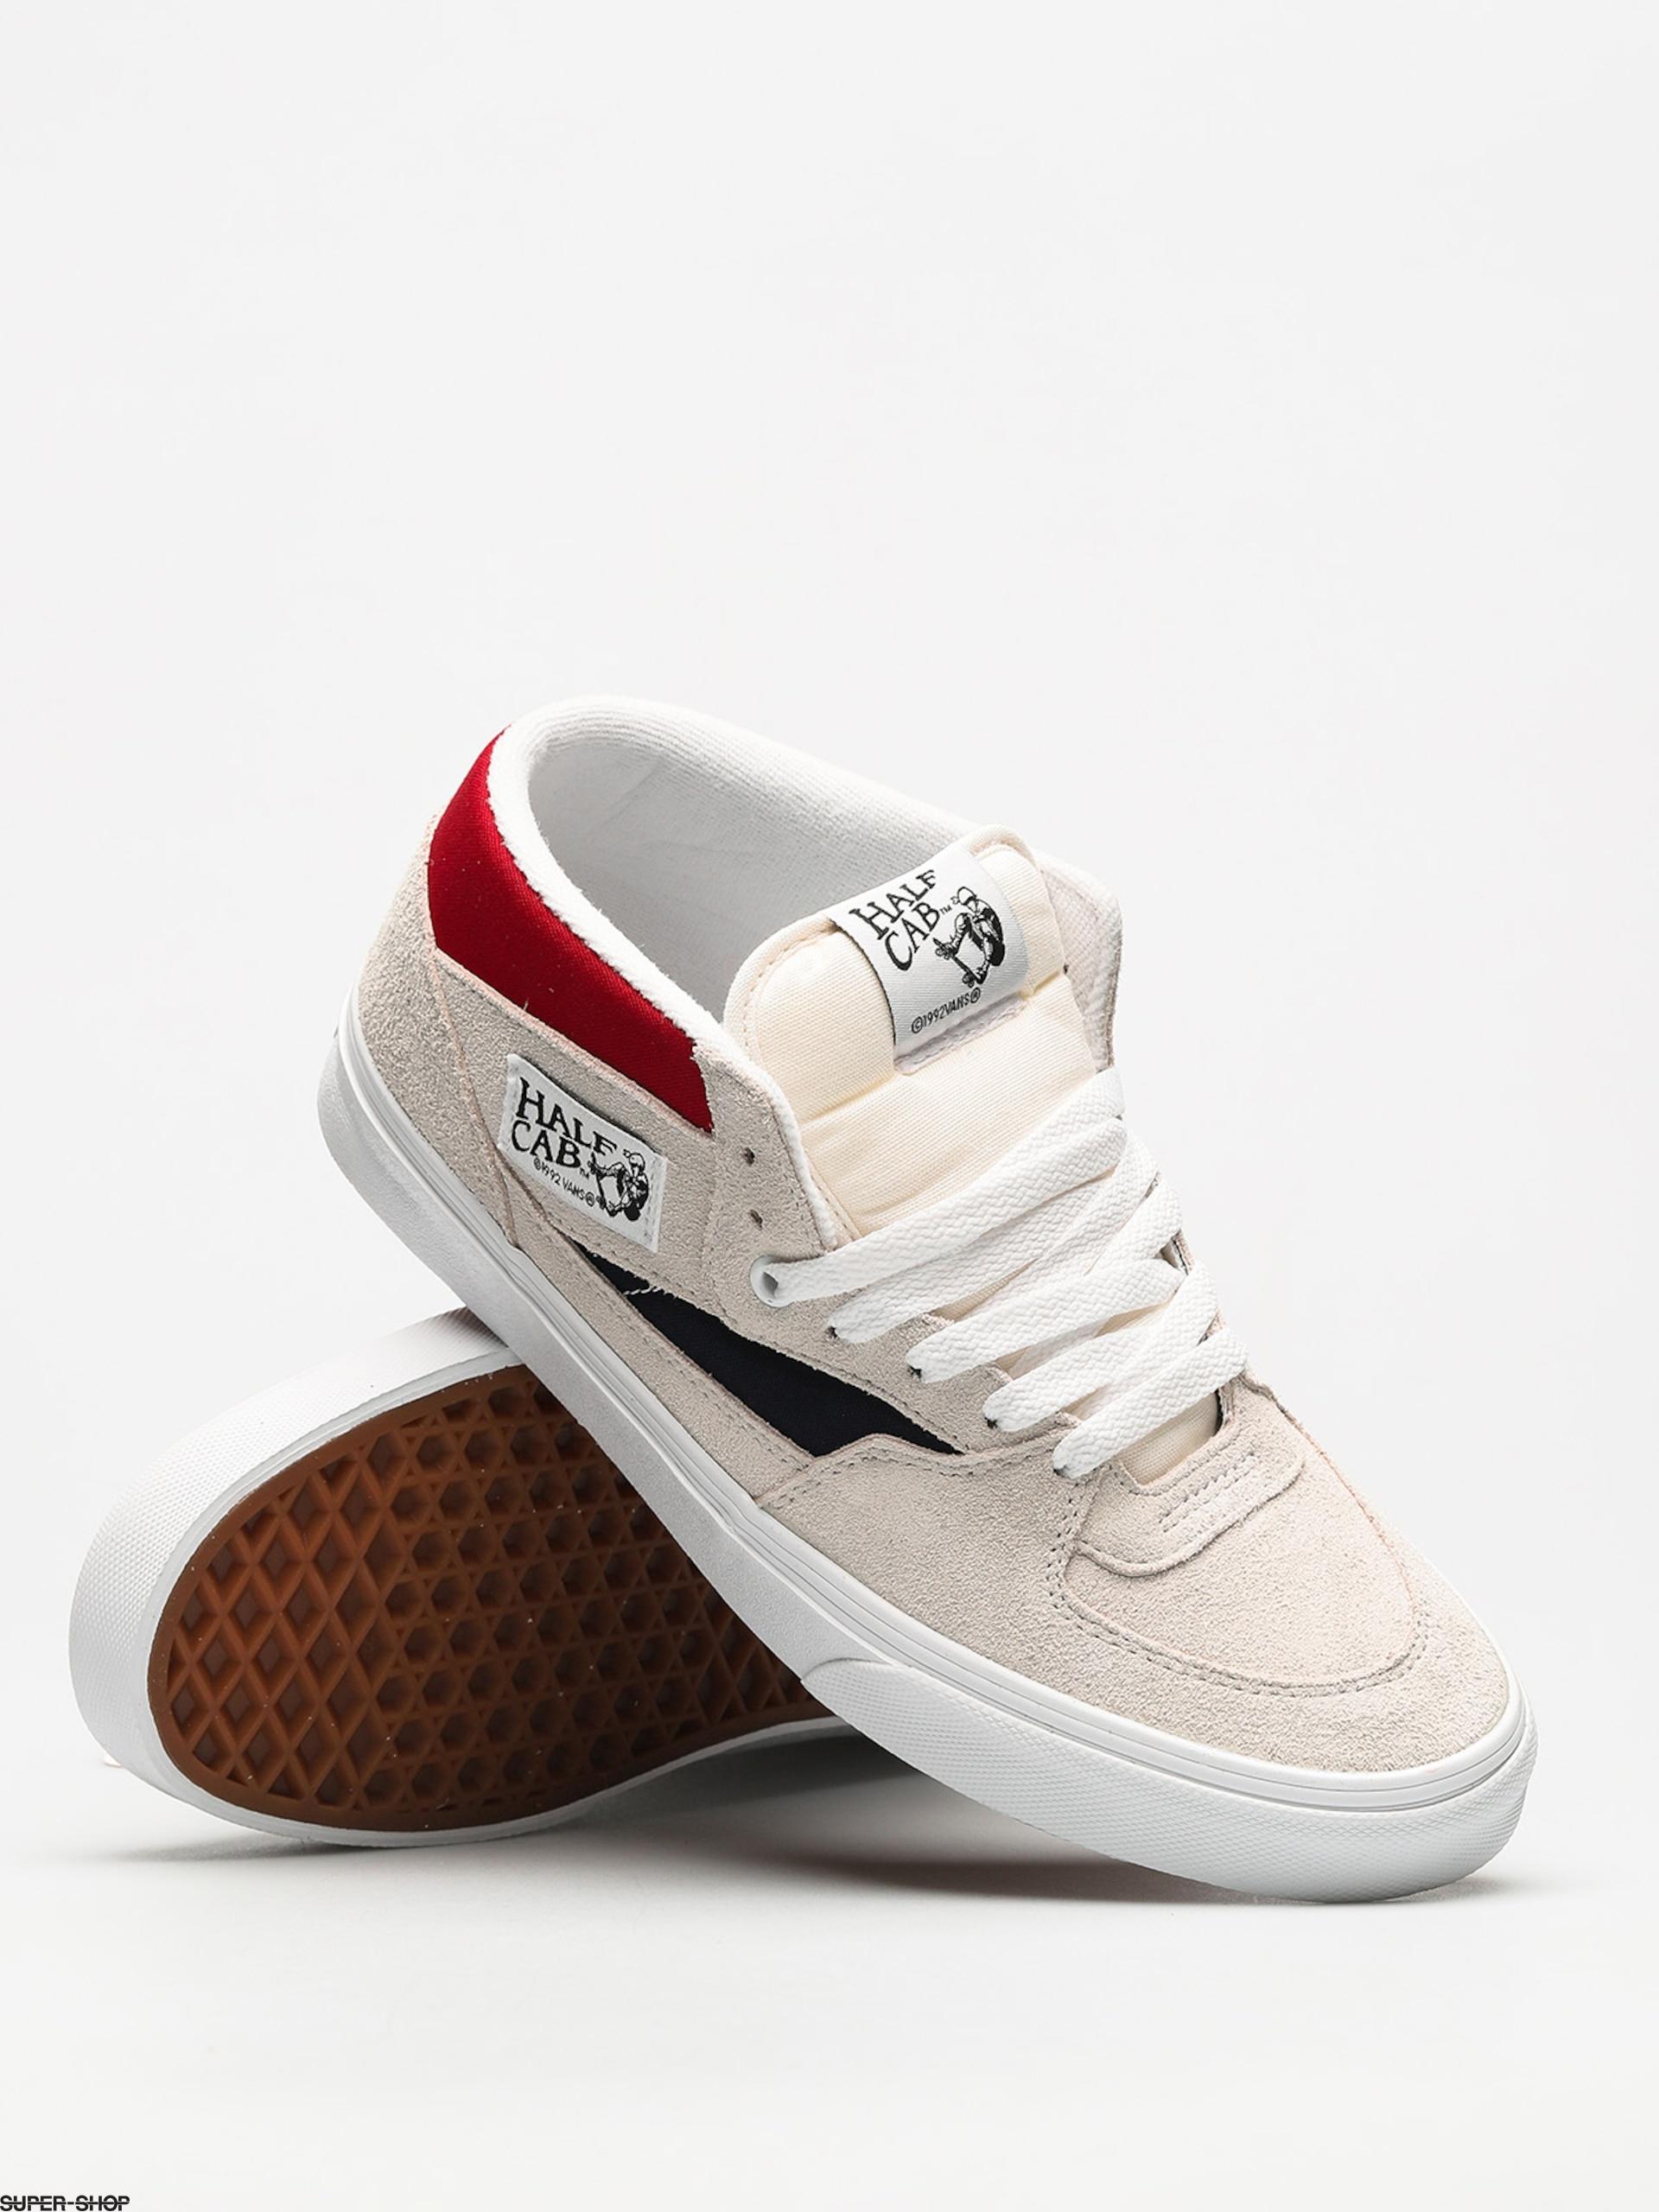 51f380d762f519 Vans Shoes Half Cab (retro block white red dress blues)